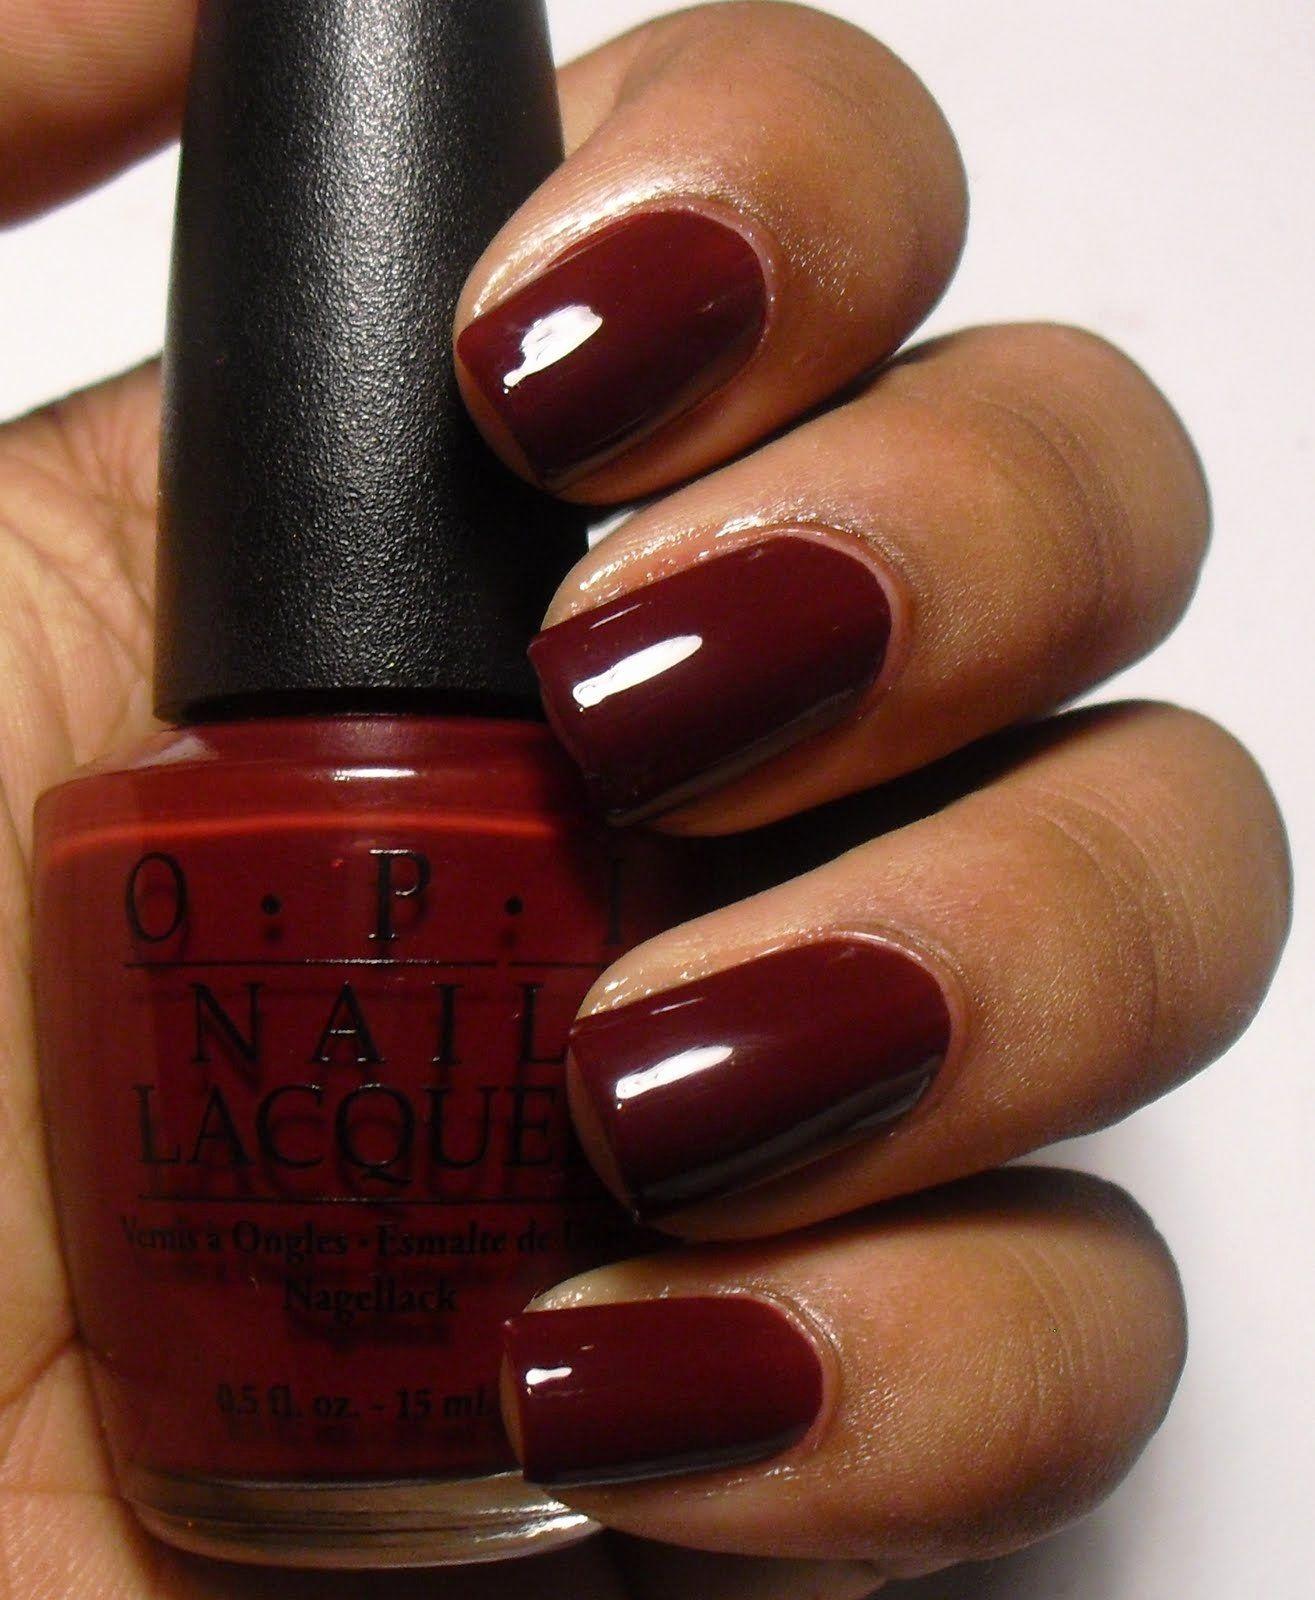 Opi Nail Polish Red Colors Awesome Nail Polish Colors For